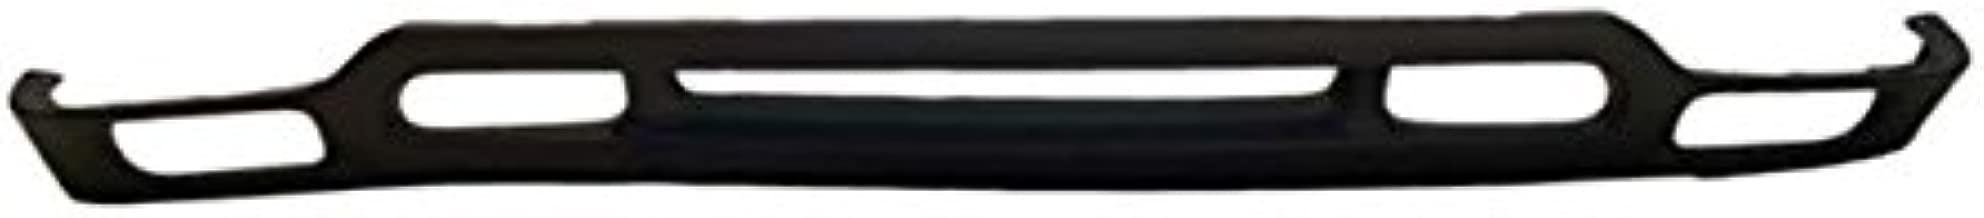 Partslink Number GM1092169 OE Replacement GMC Sierra Front Bumper Deflector